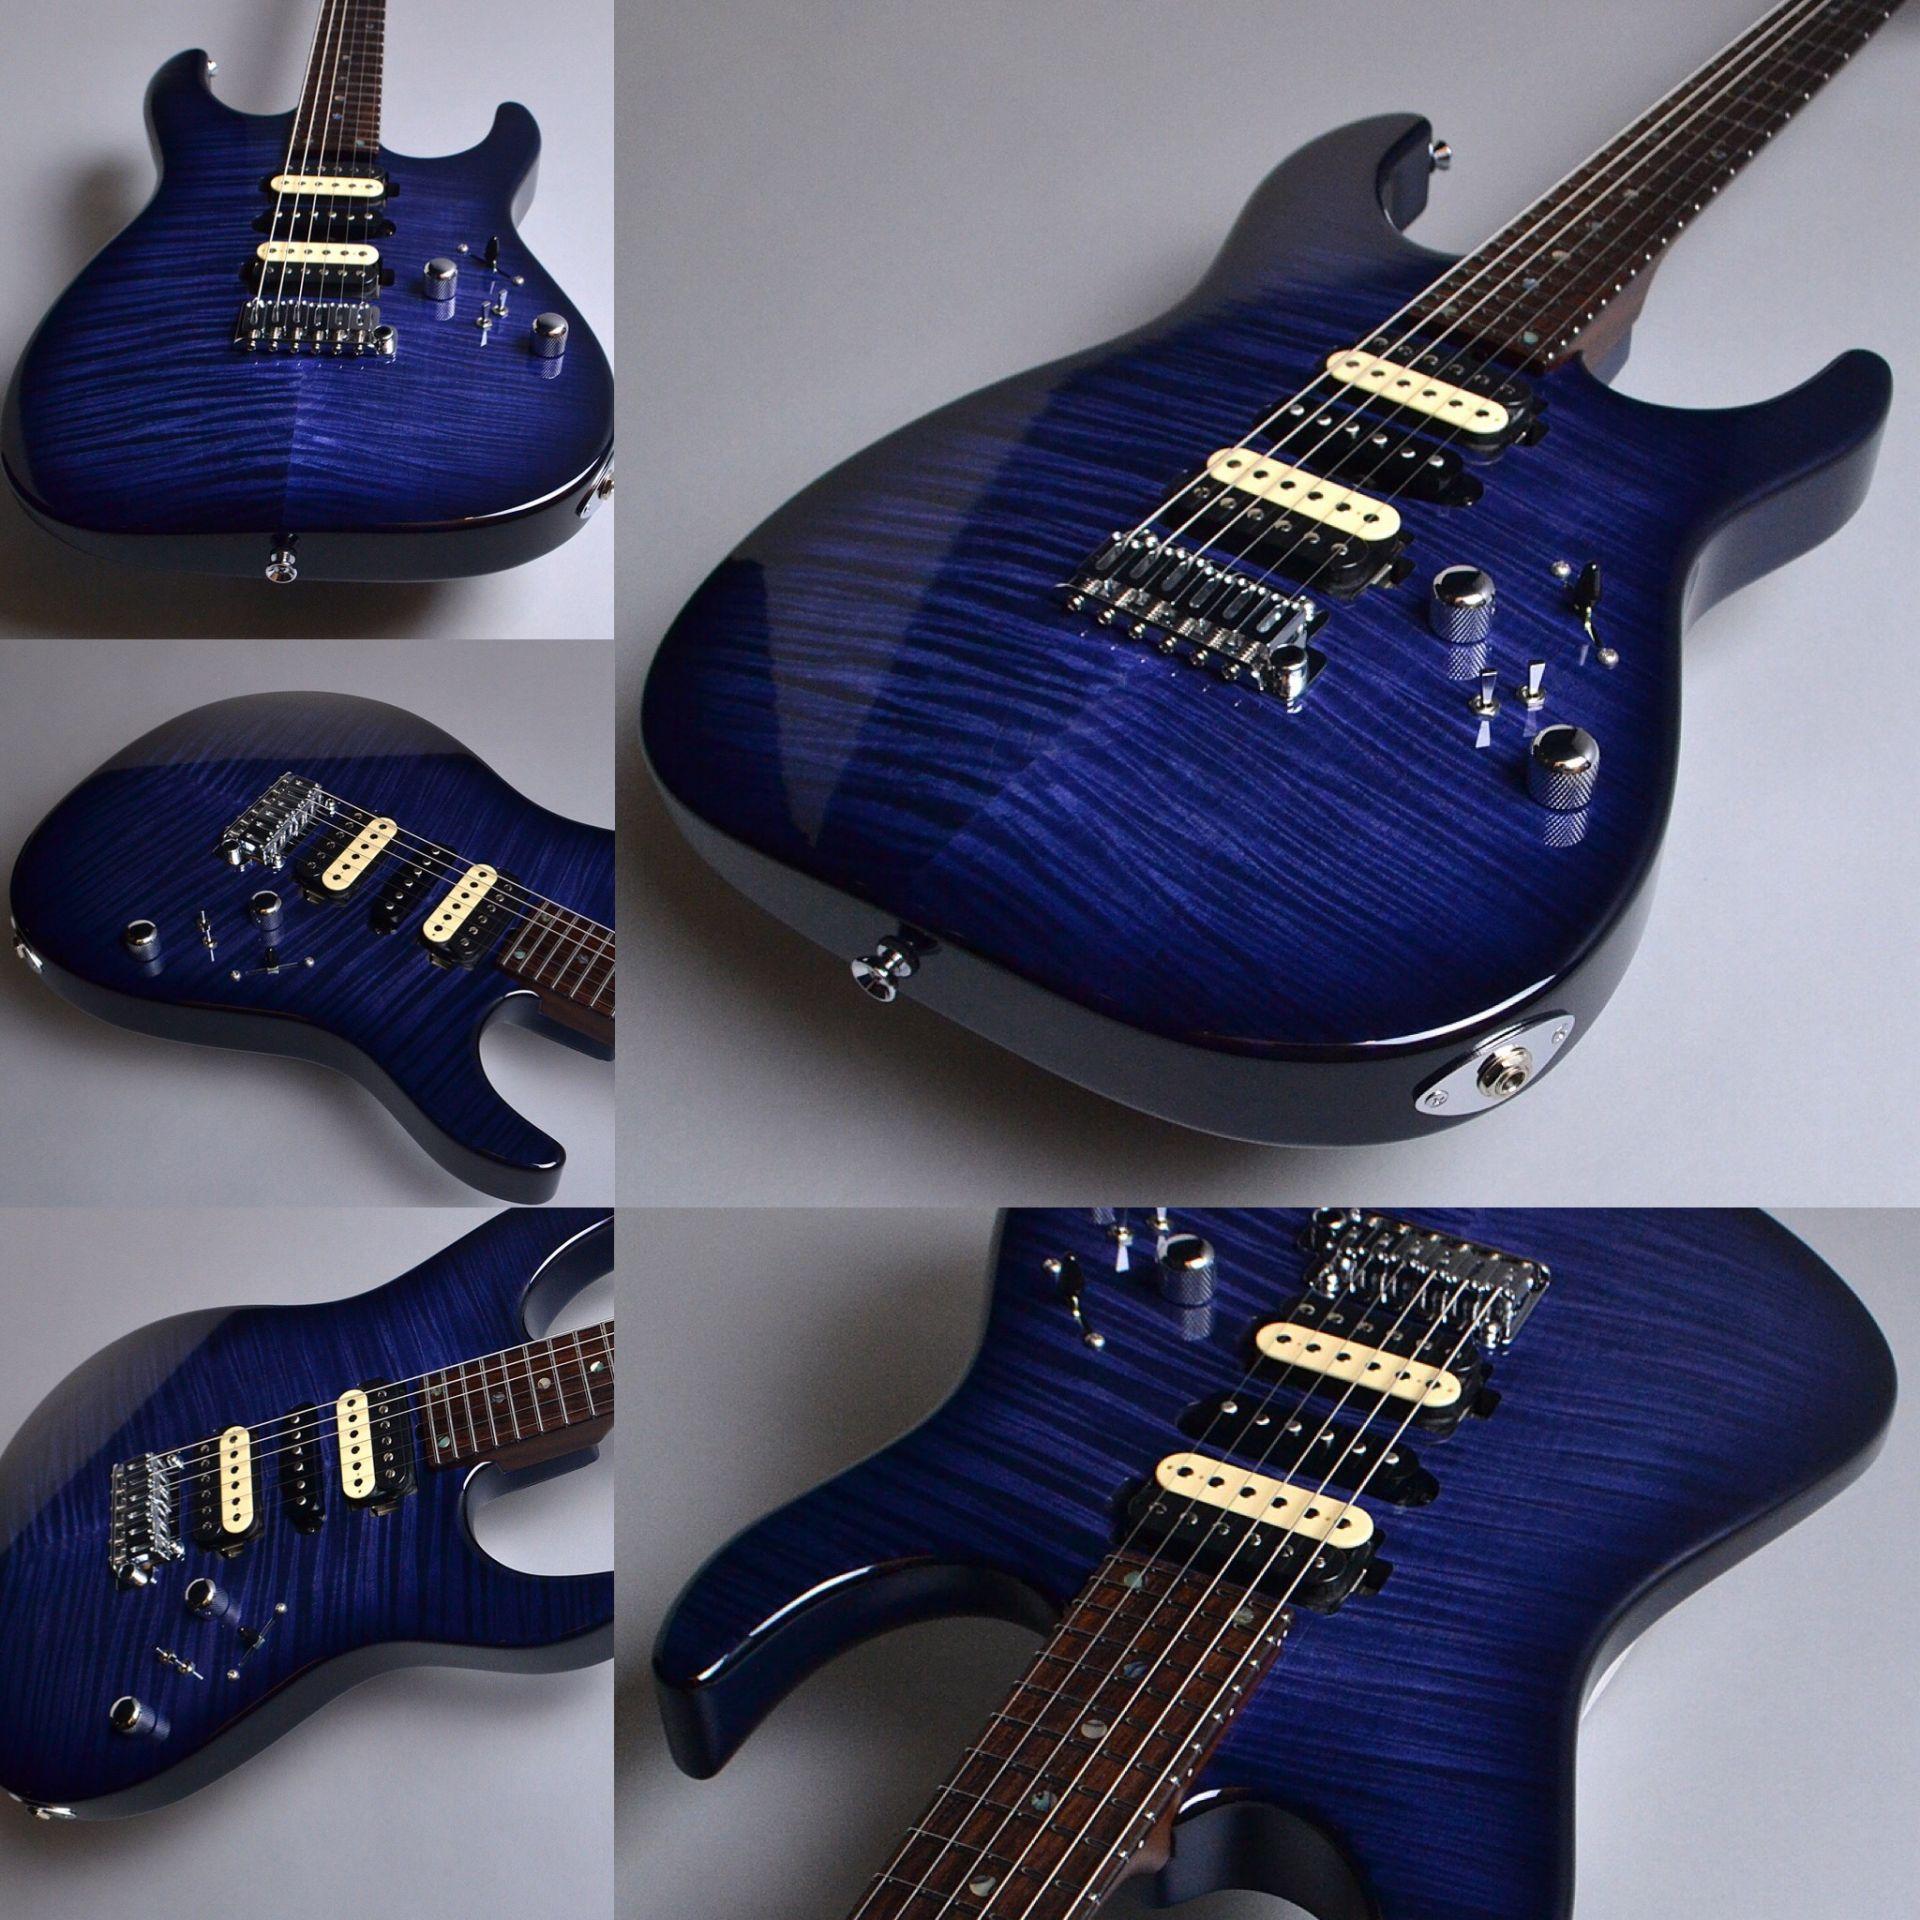 DST24 Custom Made Whale Blue Burst (WBB) 【S/N:013645】のケース・その他画像